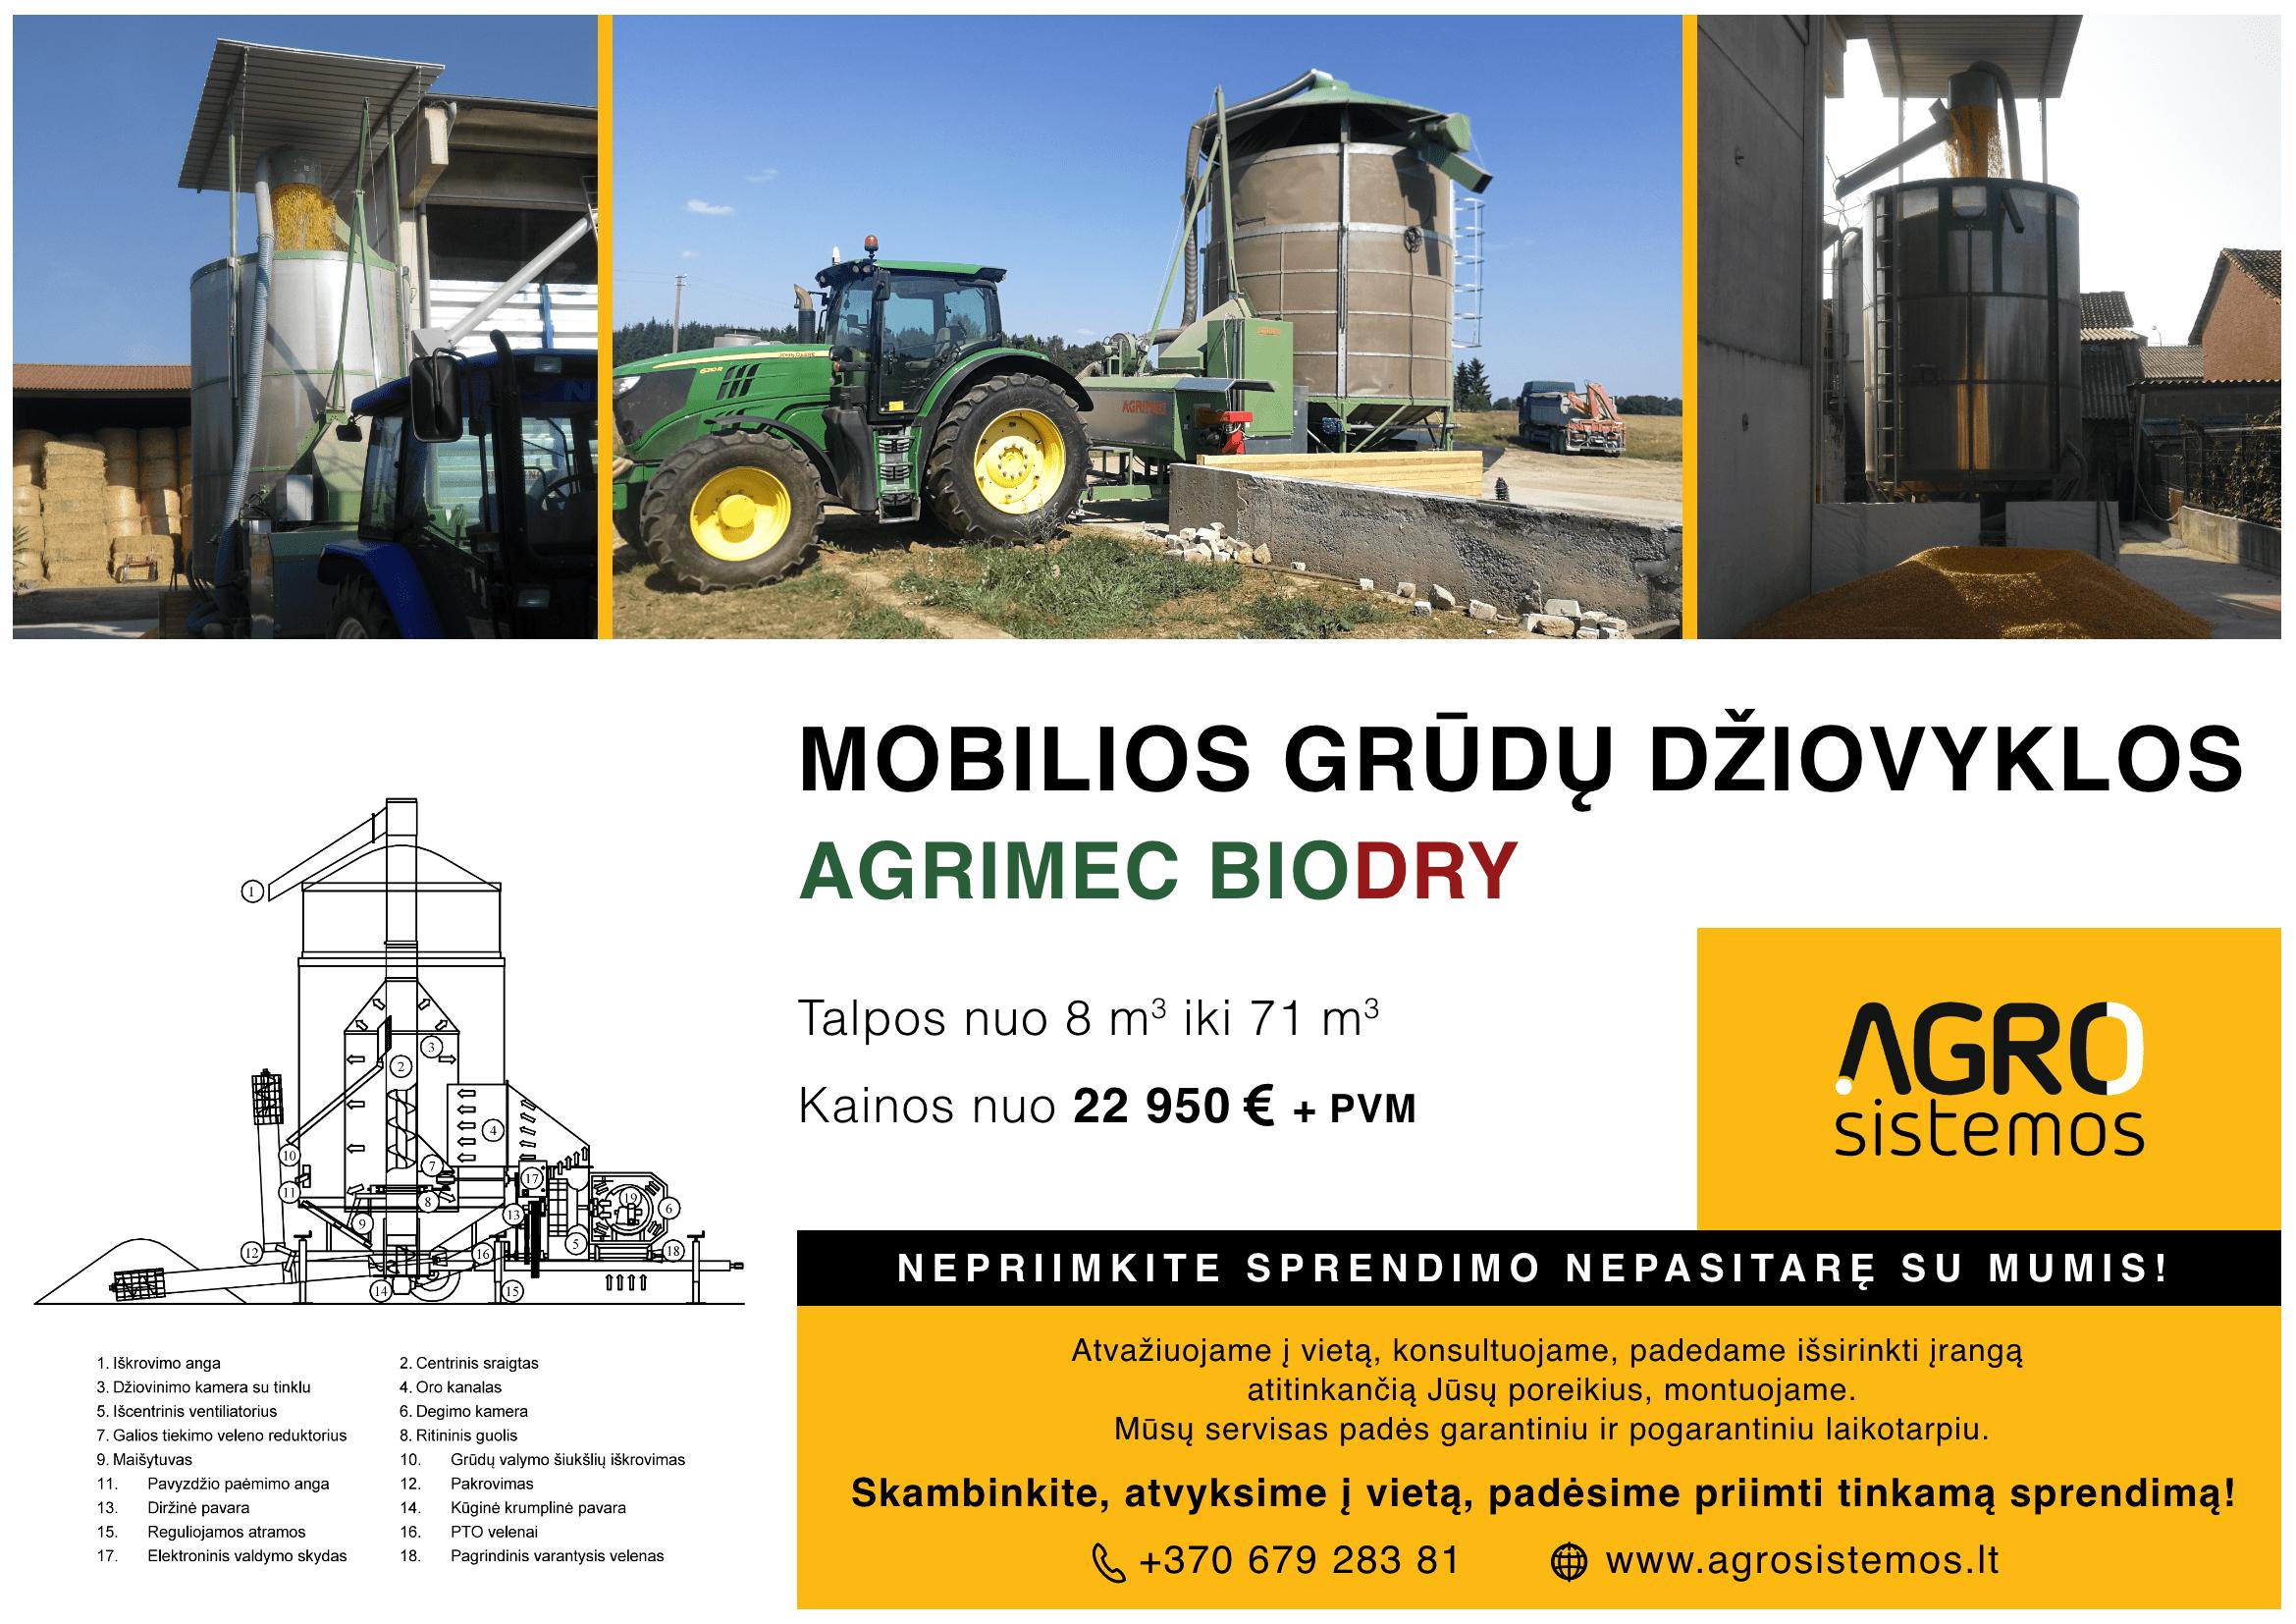 Mobilios grūdų džiovyklos Agrimec Biodry